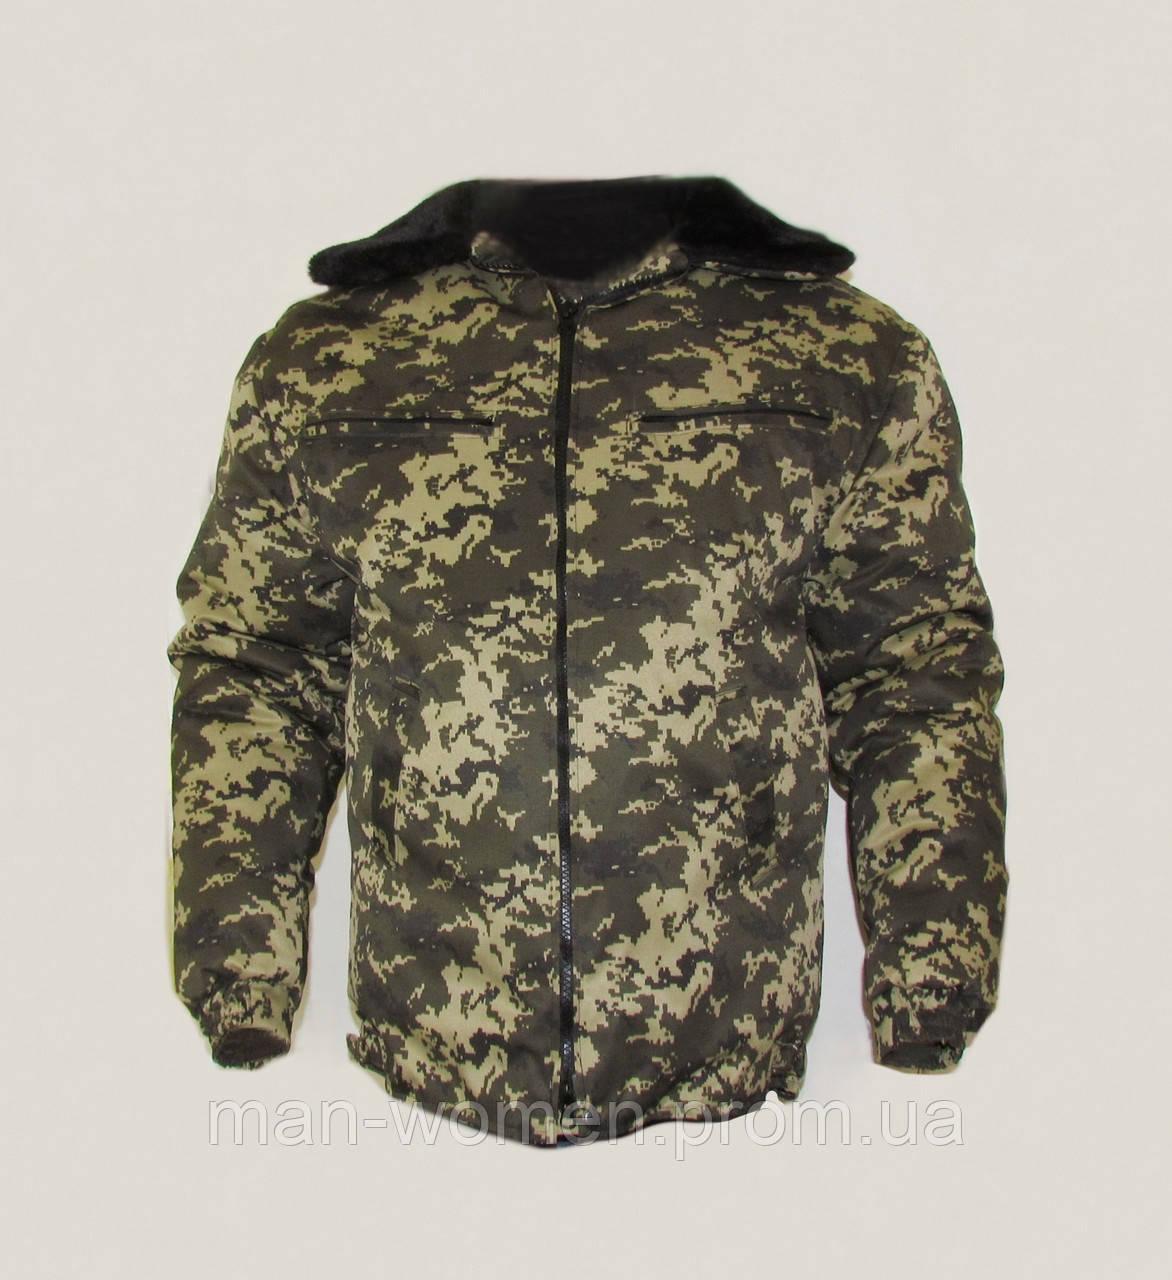 БУШЛАТ! Куртка камуфлированная. Утеплённая. Цифра пограничная. Украина